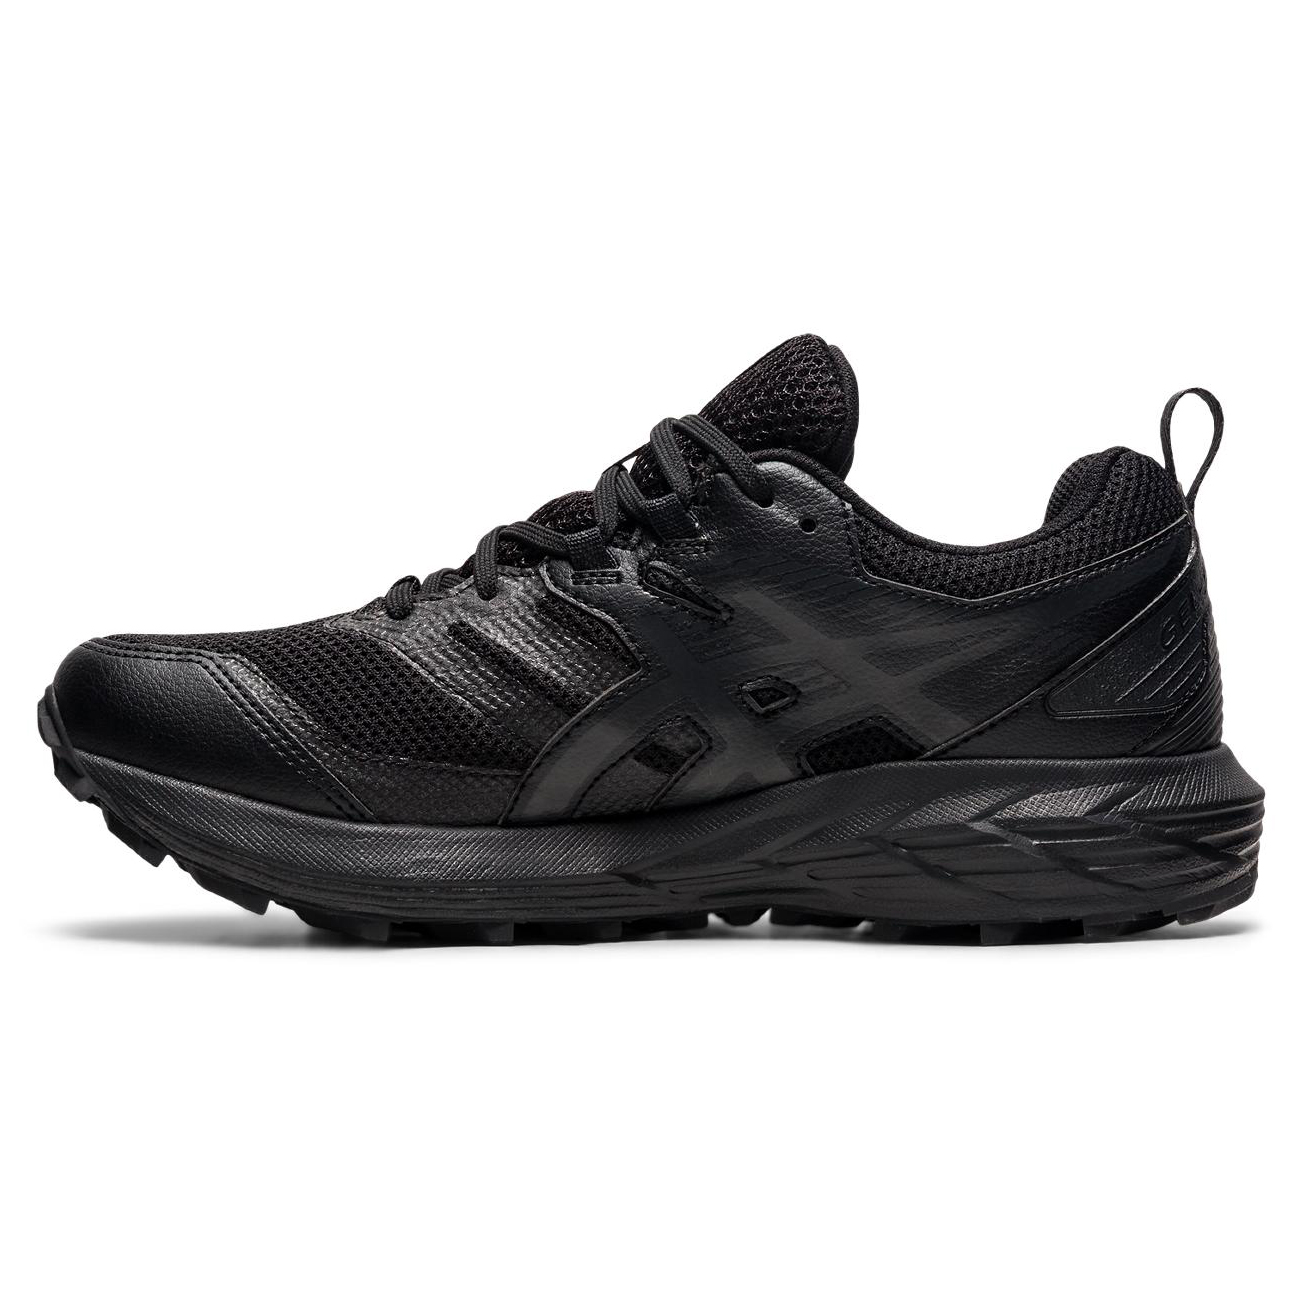 Asics - Women's Gel-Sonoma 6 GTX - Trail running shoes - Black / Sun Peach | 5,5 (US)